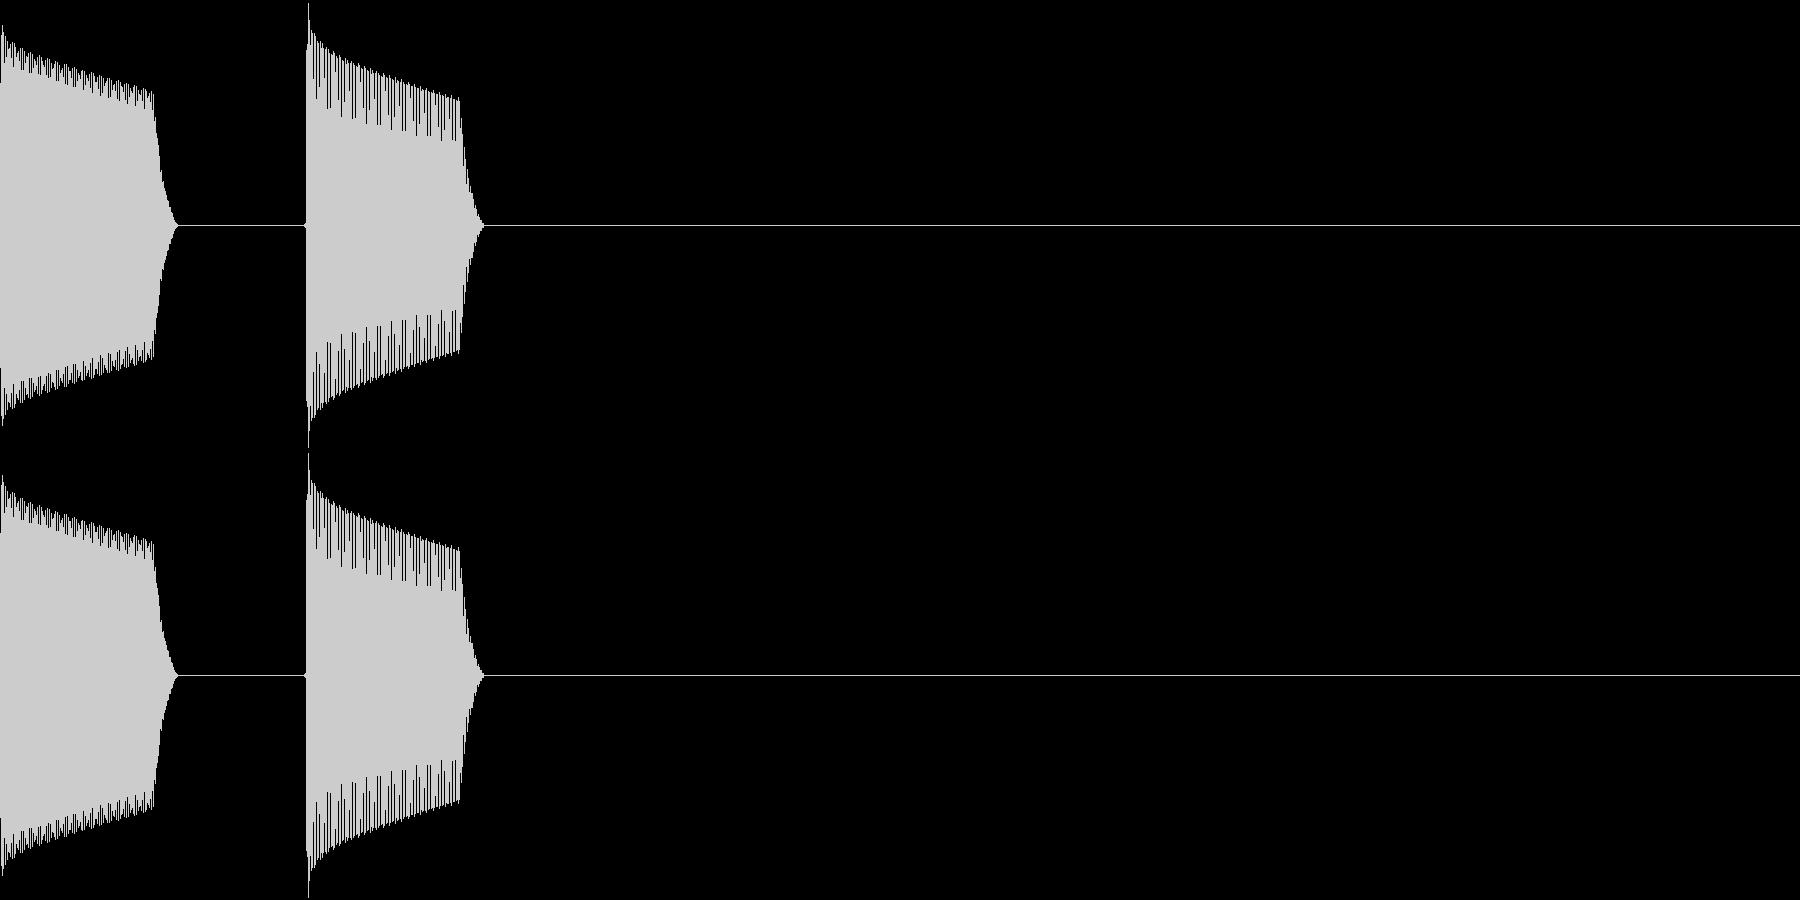 ATM 操作音 1の未再生の波形